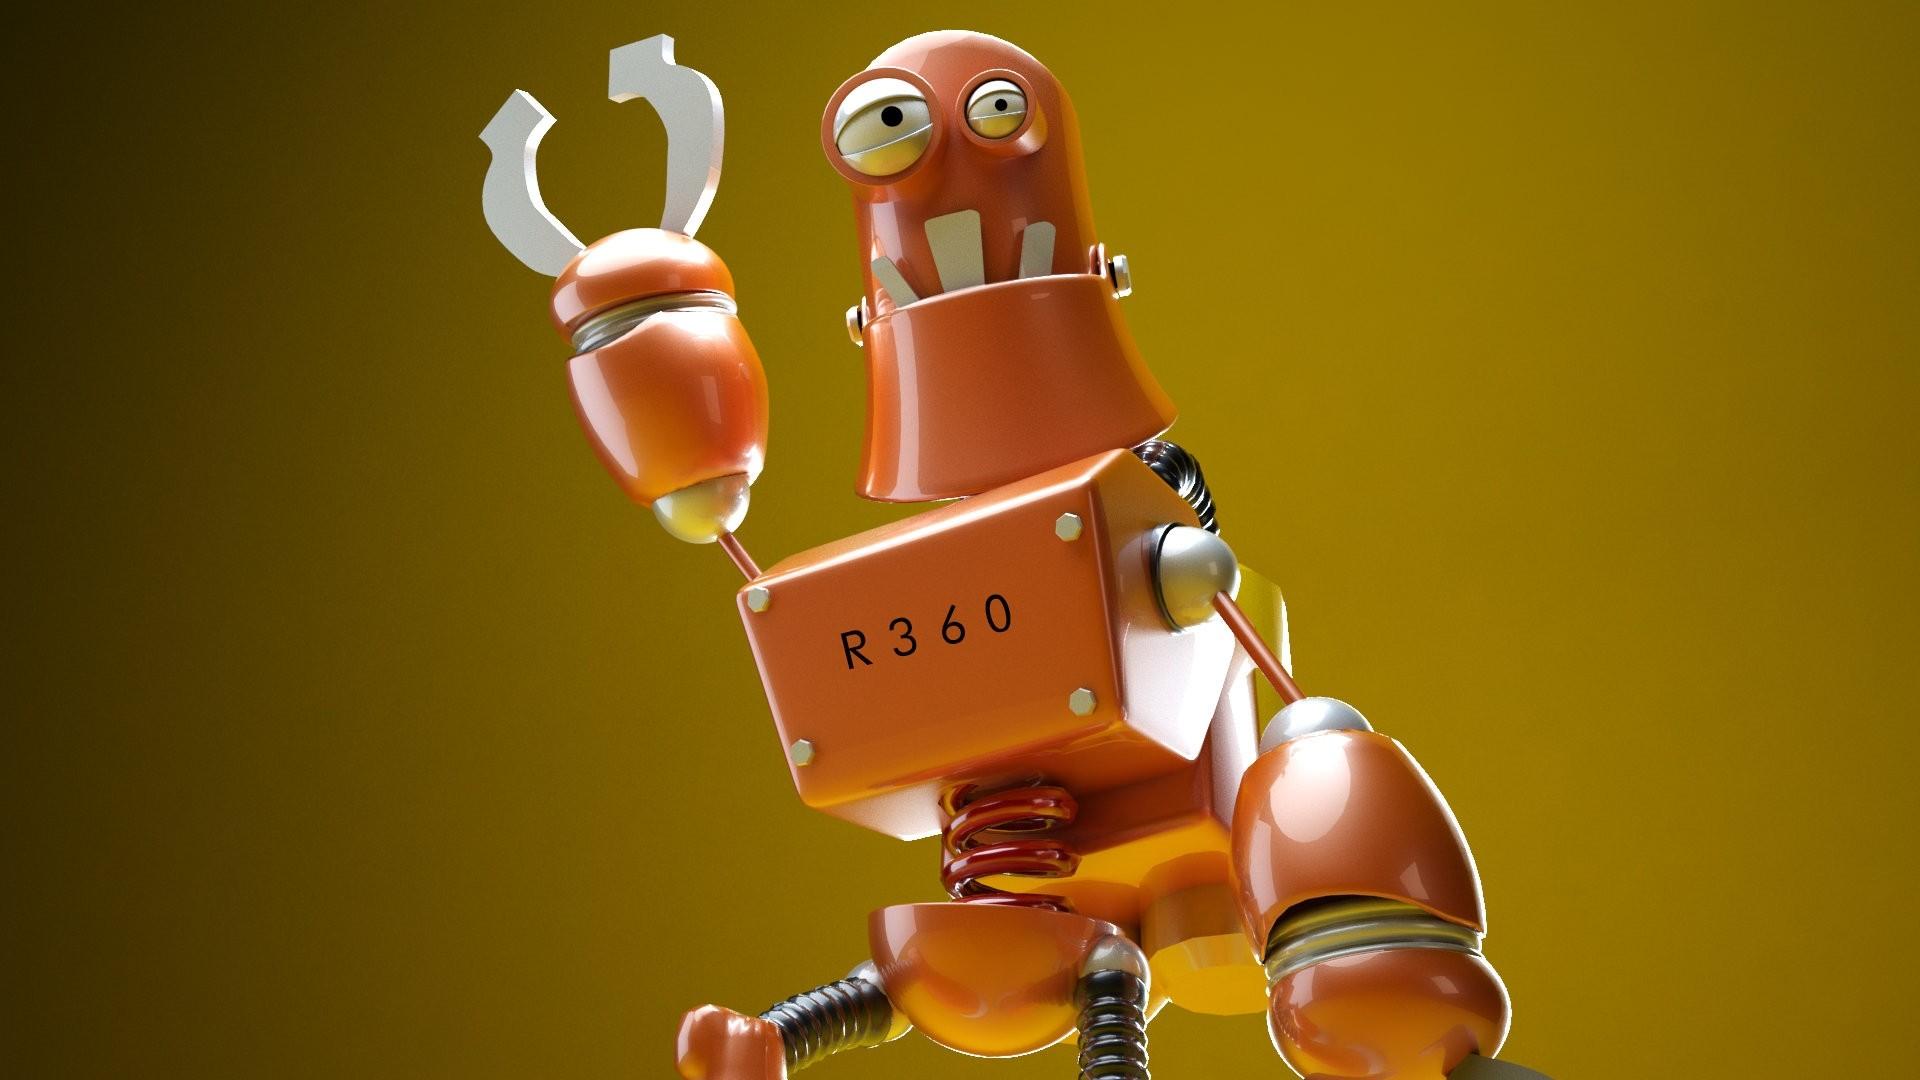 Robot Desktop wallpaper